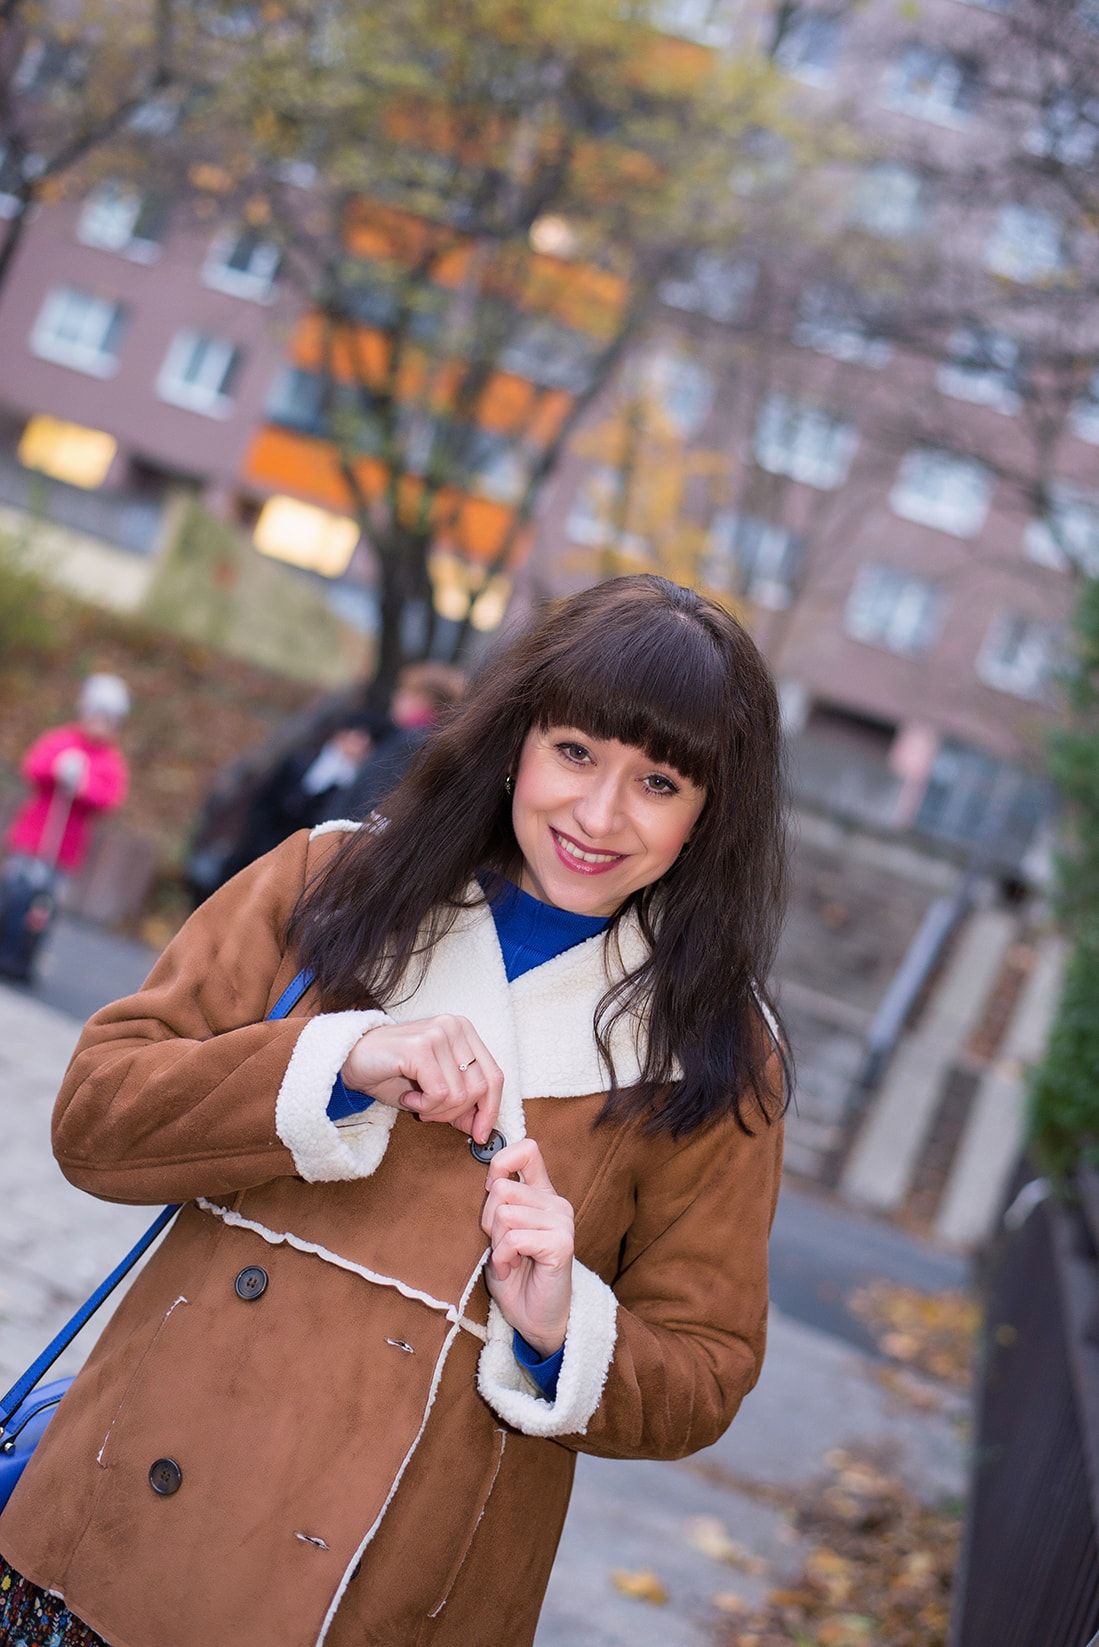 V NOWOM TARGU A SEMIŠOVÁ BUNDA NIELEN PRE BLOGERKU_Katharina-fashion is beautiful blog 9_Kvetovaná plisovaná sukňa_Kabelka JEJ_Katarína Jakubčová_Fashion blogerka